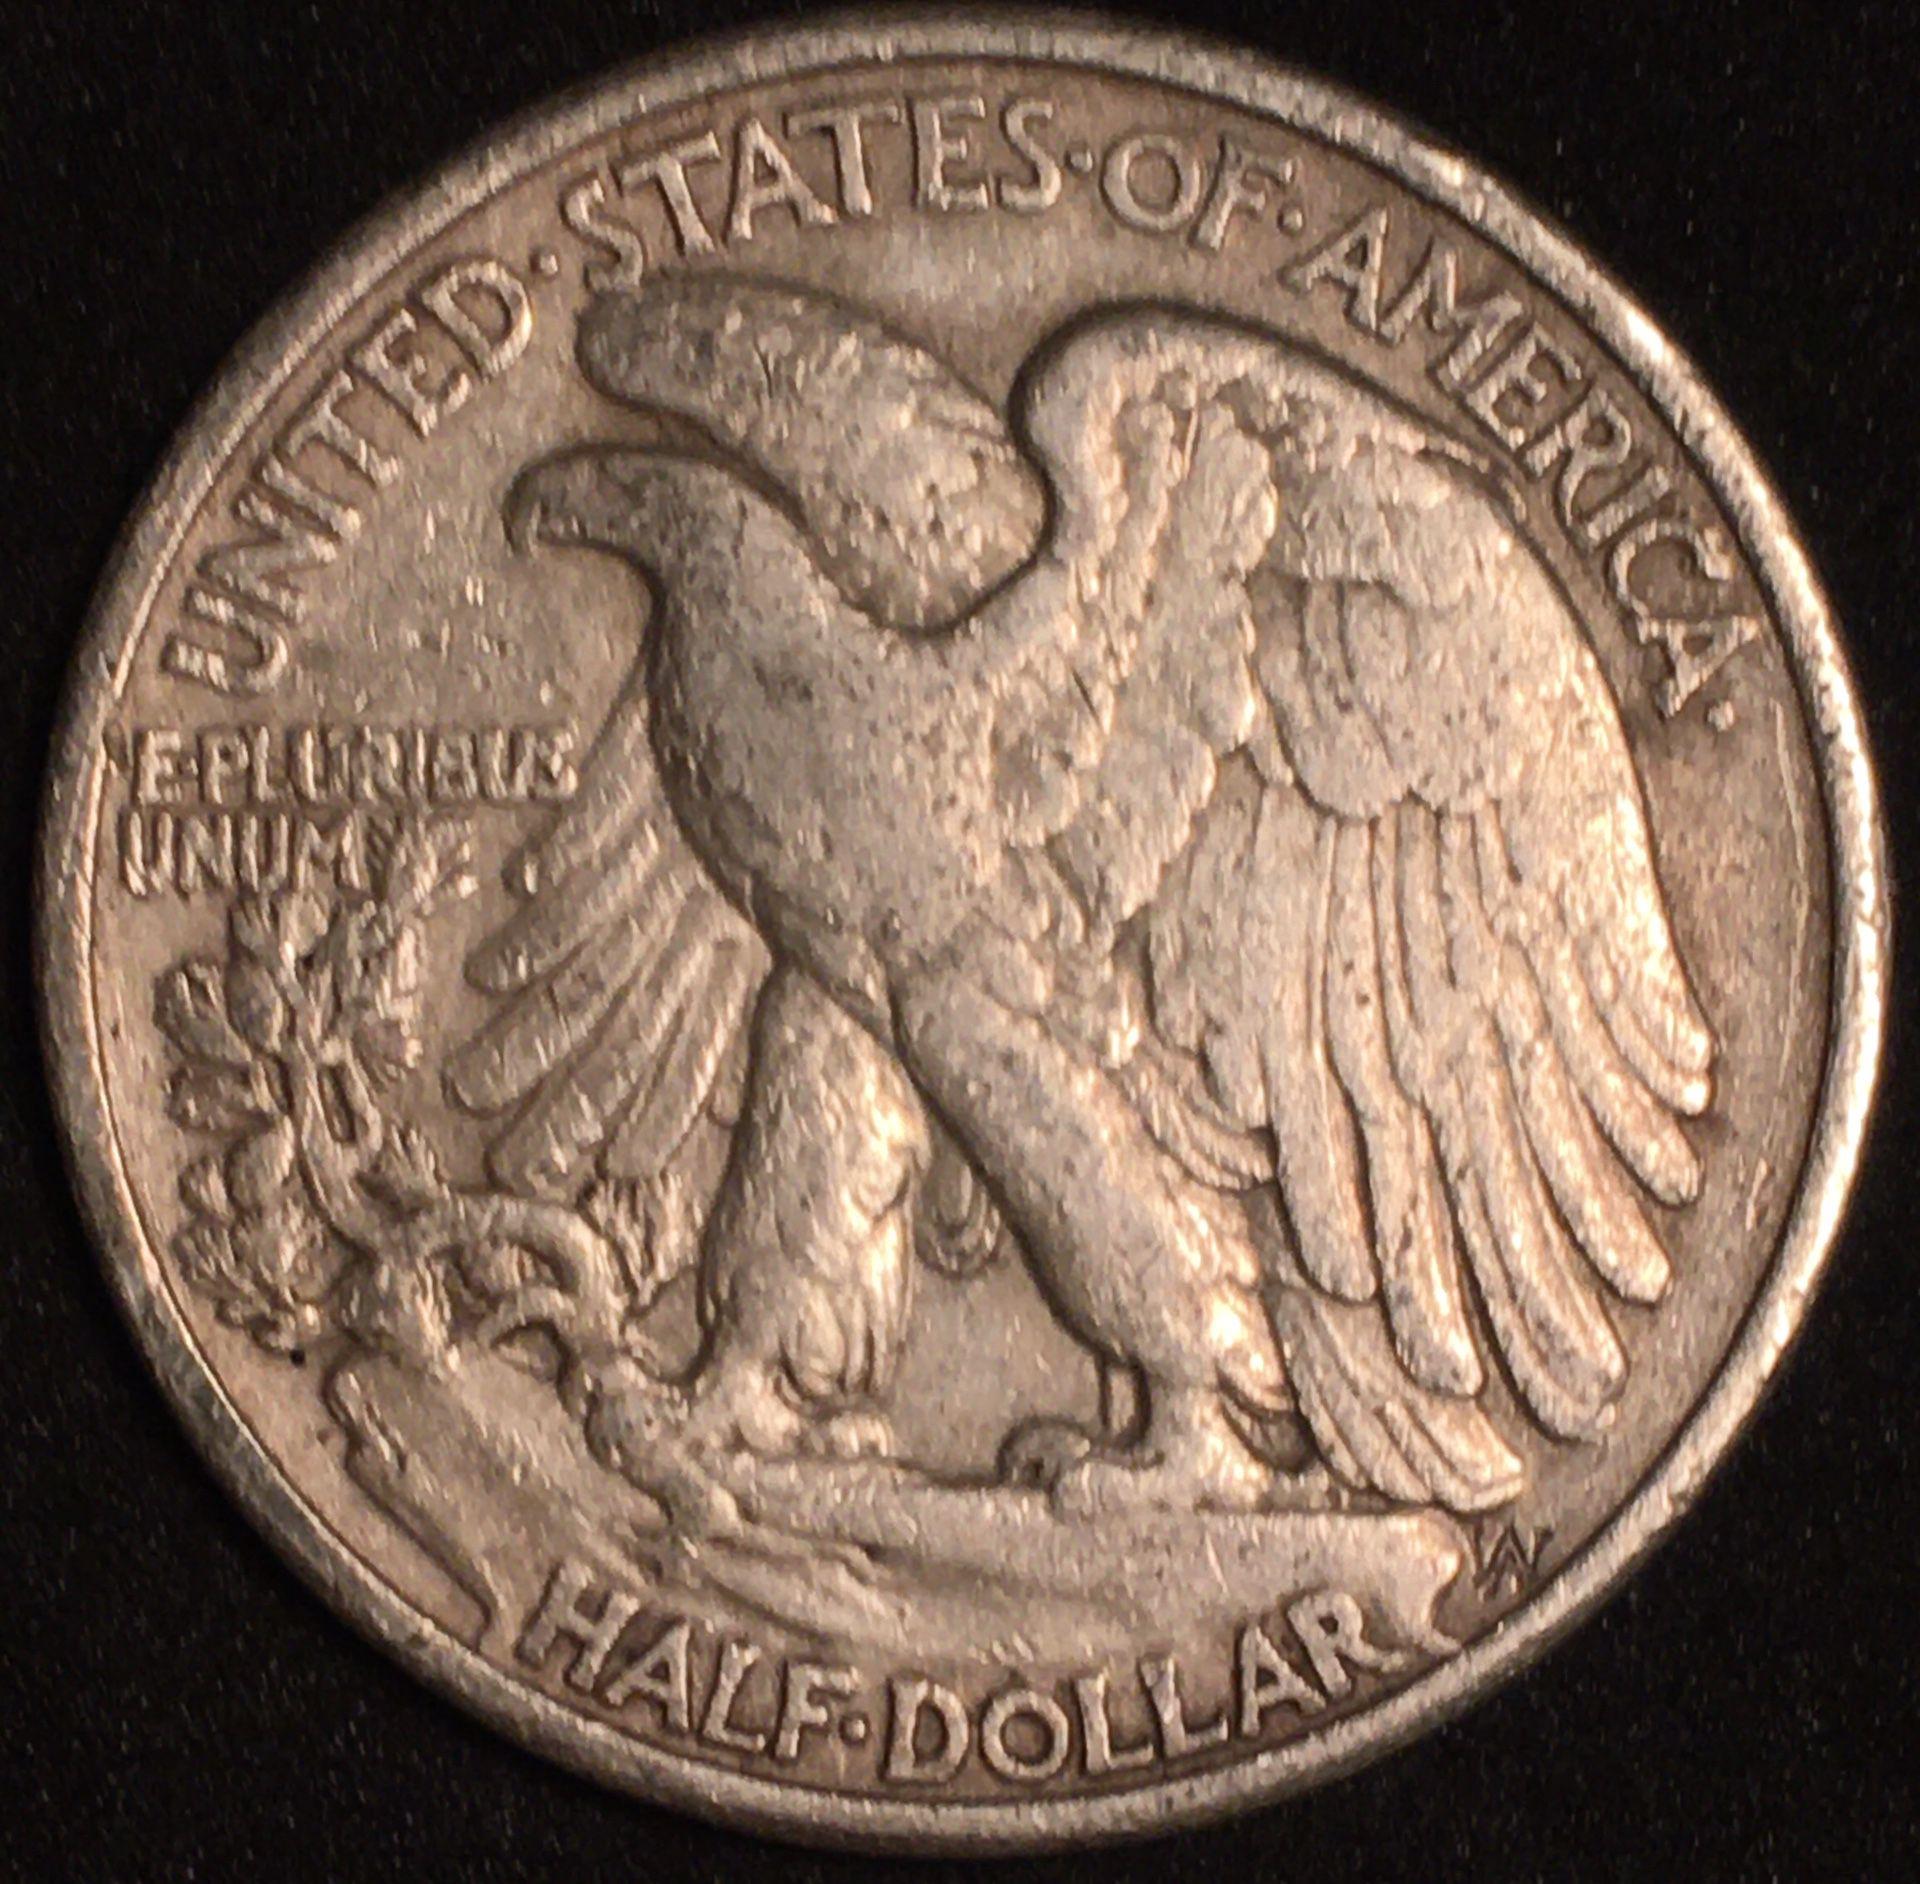 Silver 1947 Walking Liberty Half Dollar